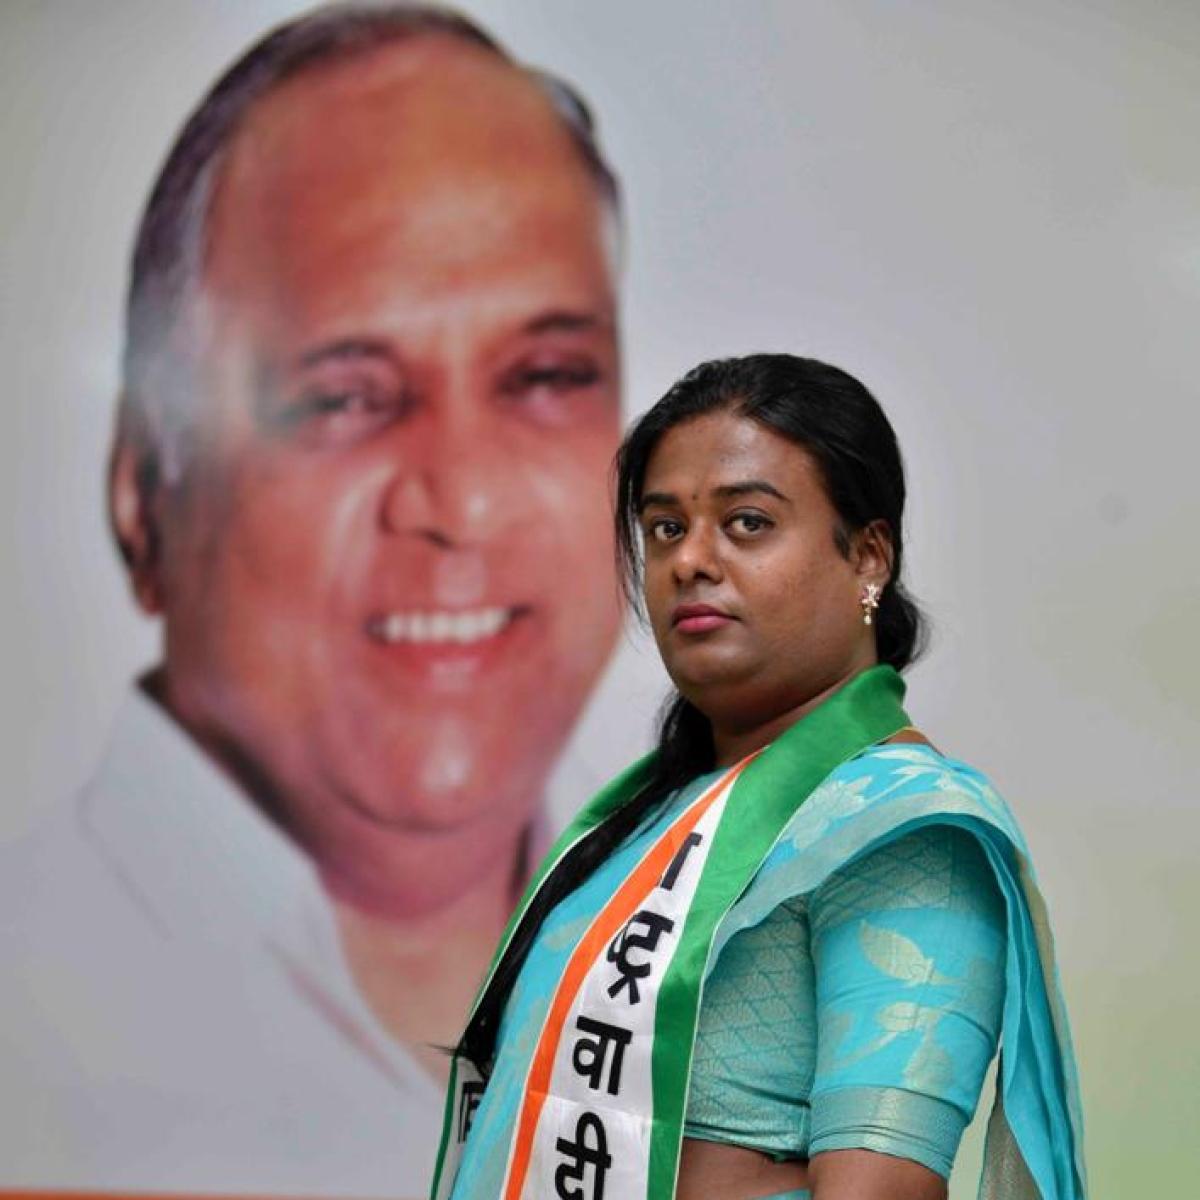 NCP state wing secretary Priya Patil claims loan denied for being 'transgender'